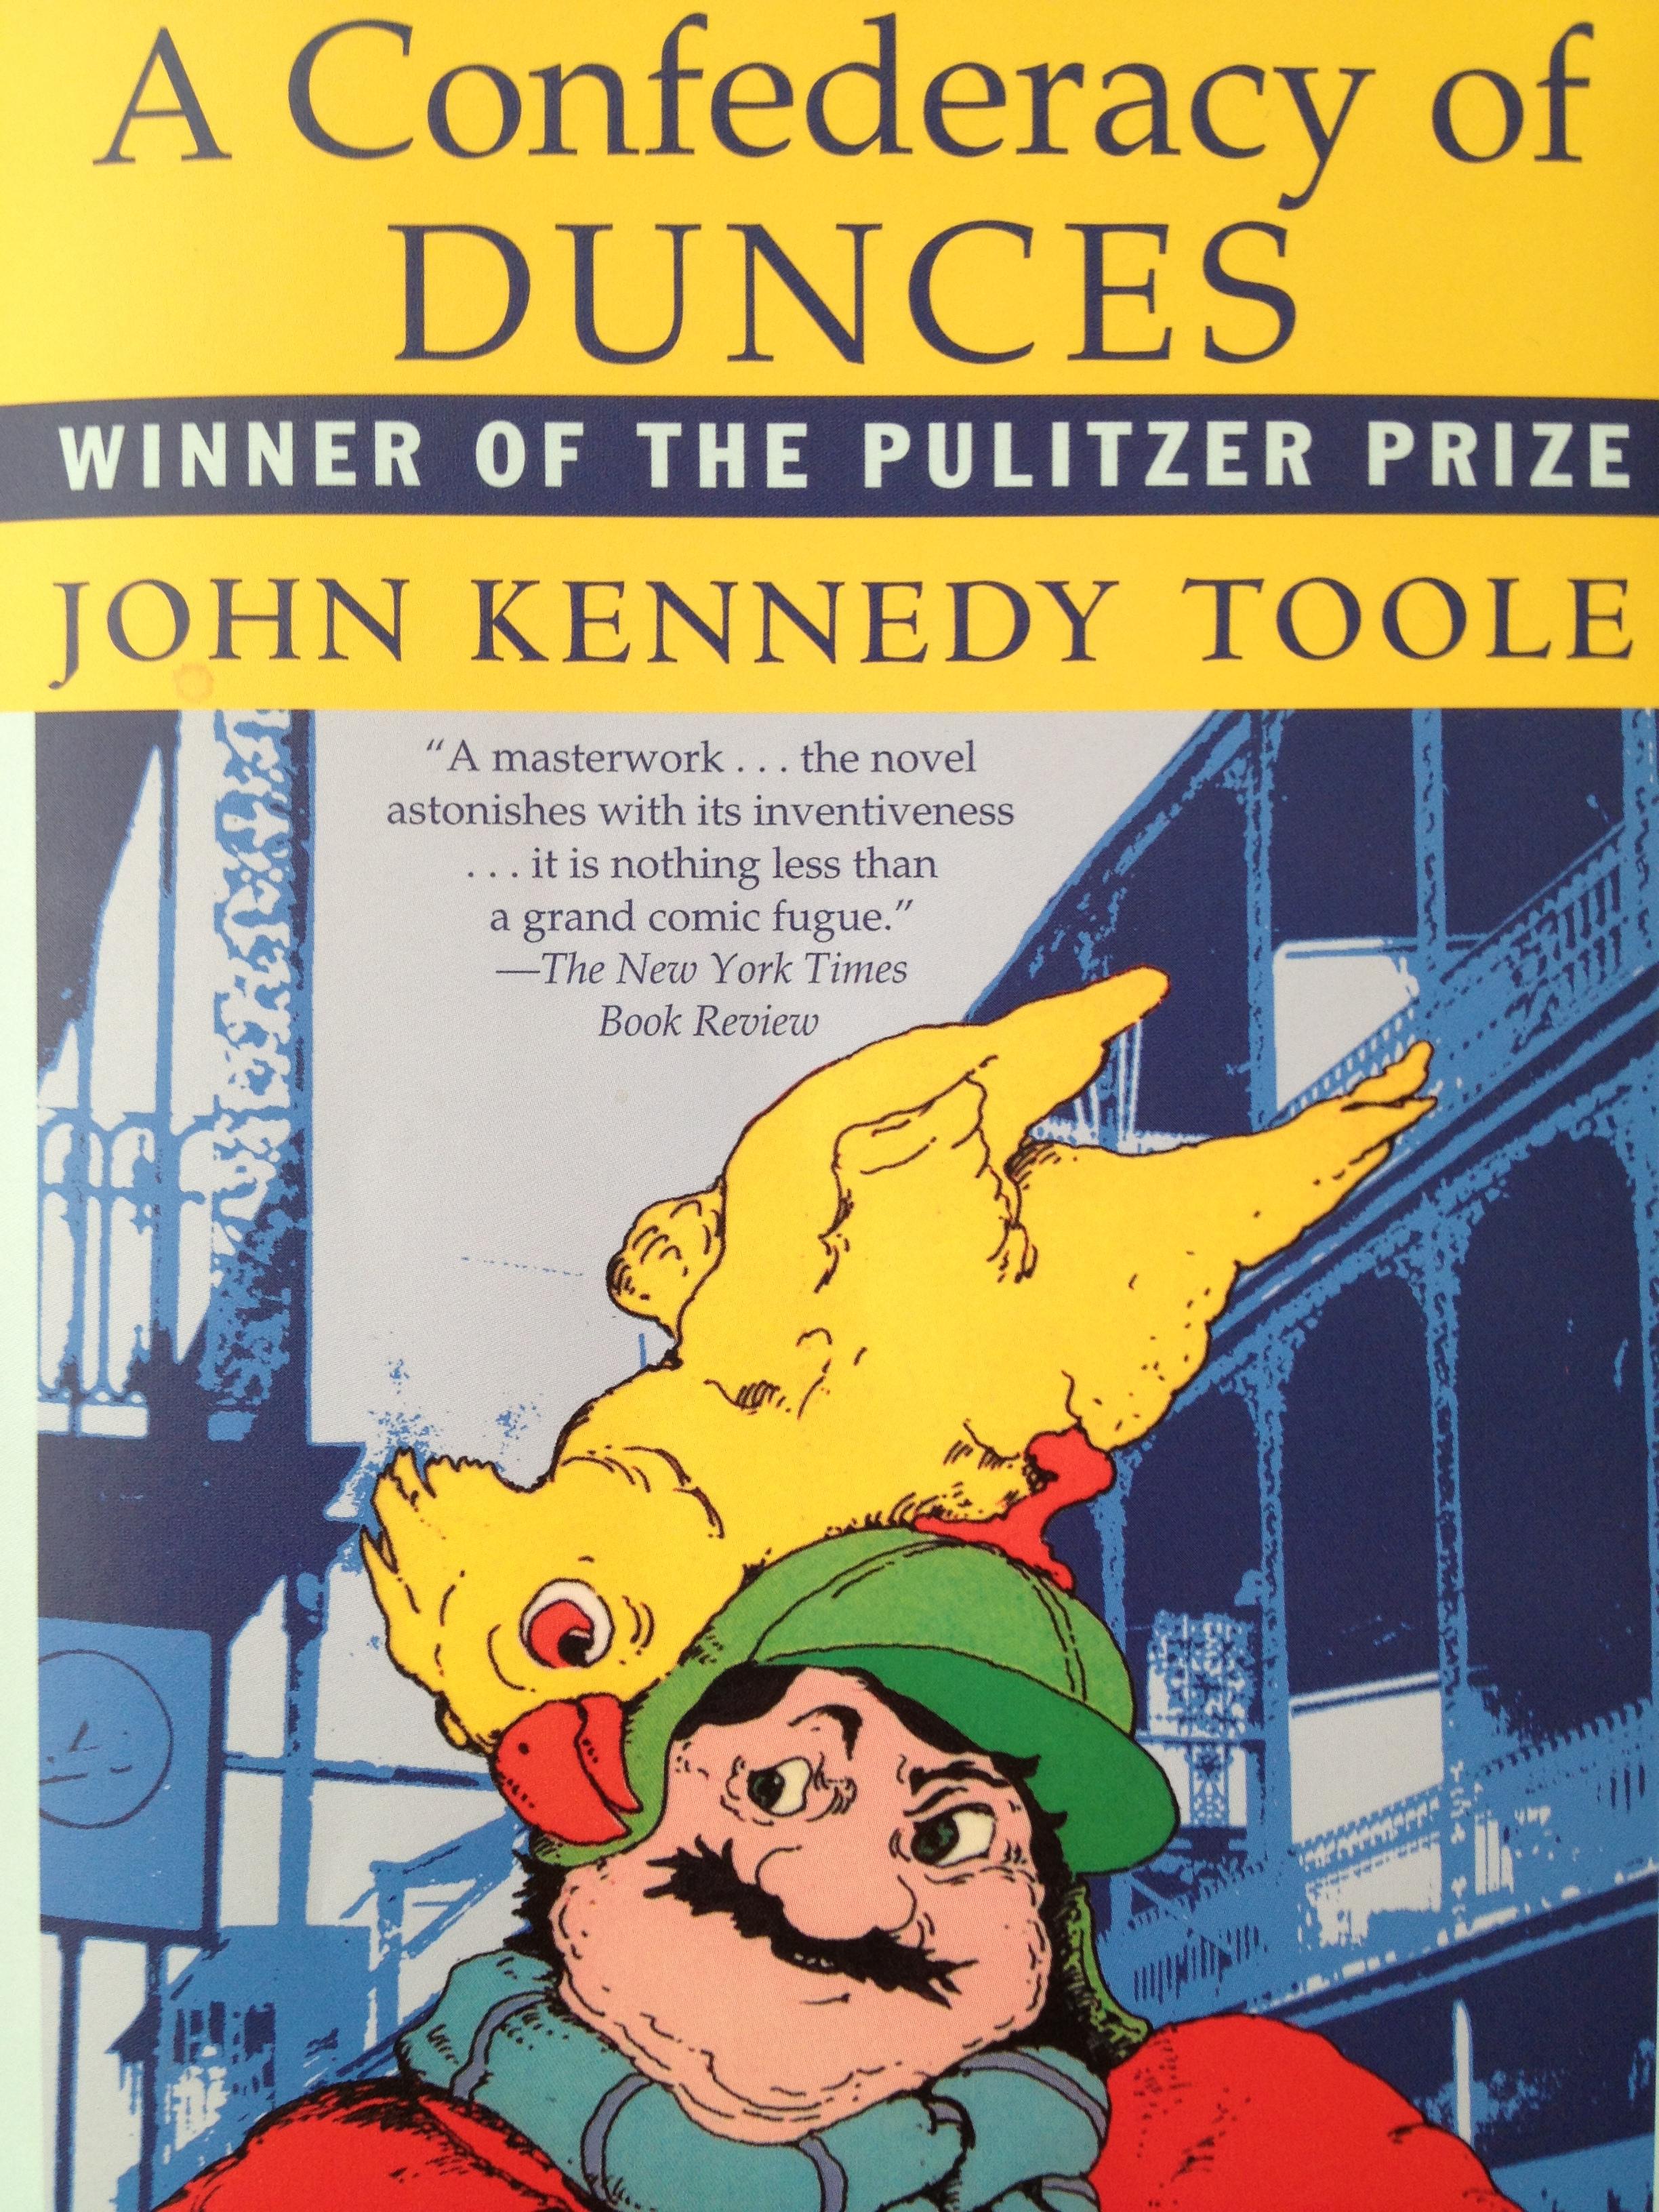 A Confederacy of Dunces book cover photo